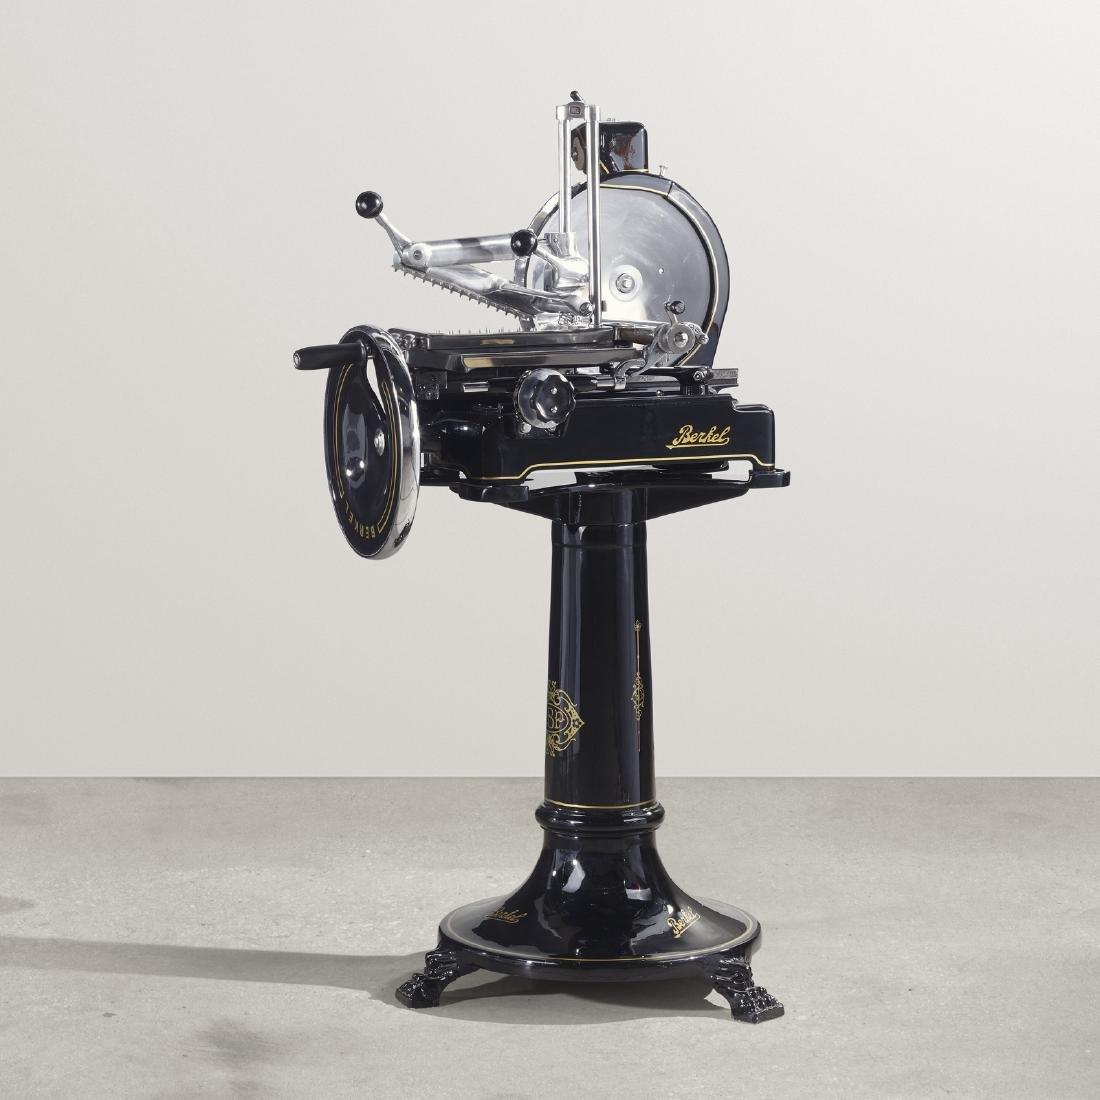 Berkel, Flywheel slicer, model 9